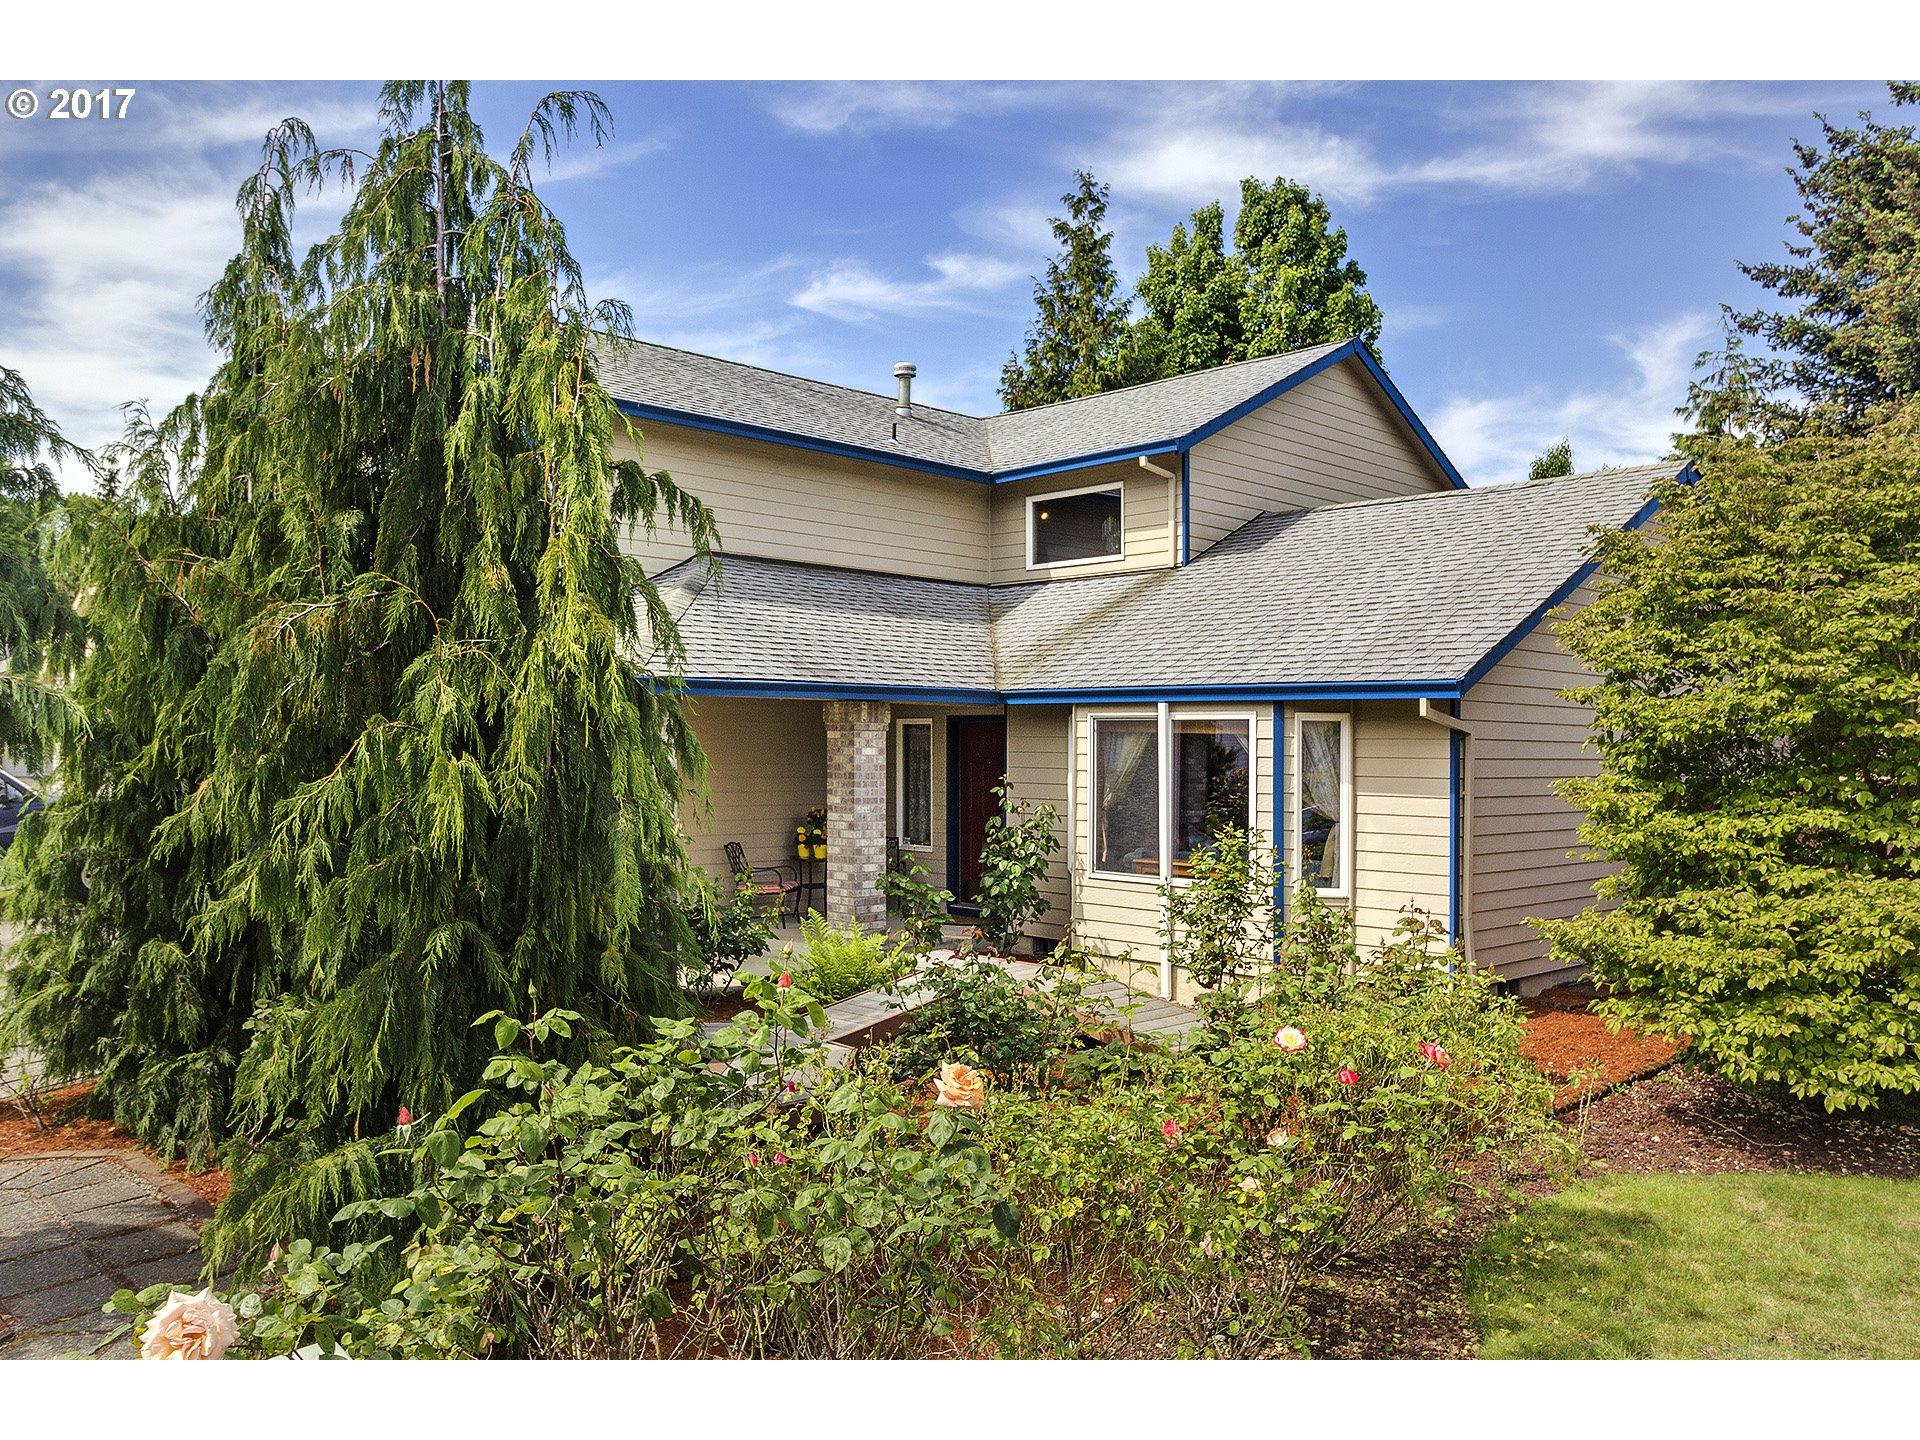 3411 NE 150TH AVE, Portland OR 97230